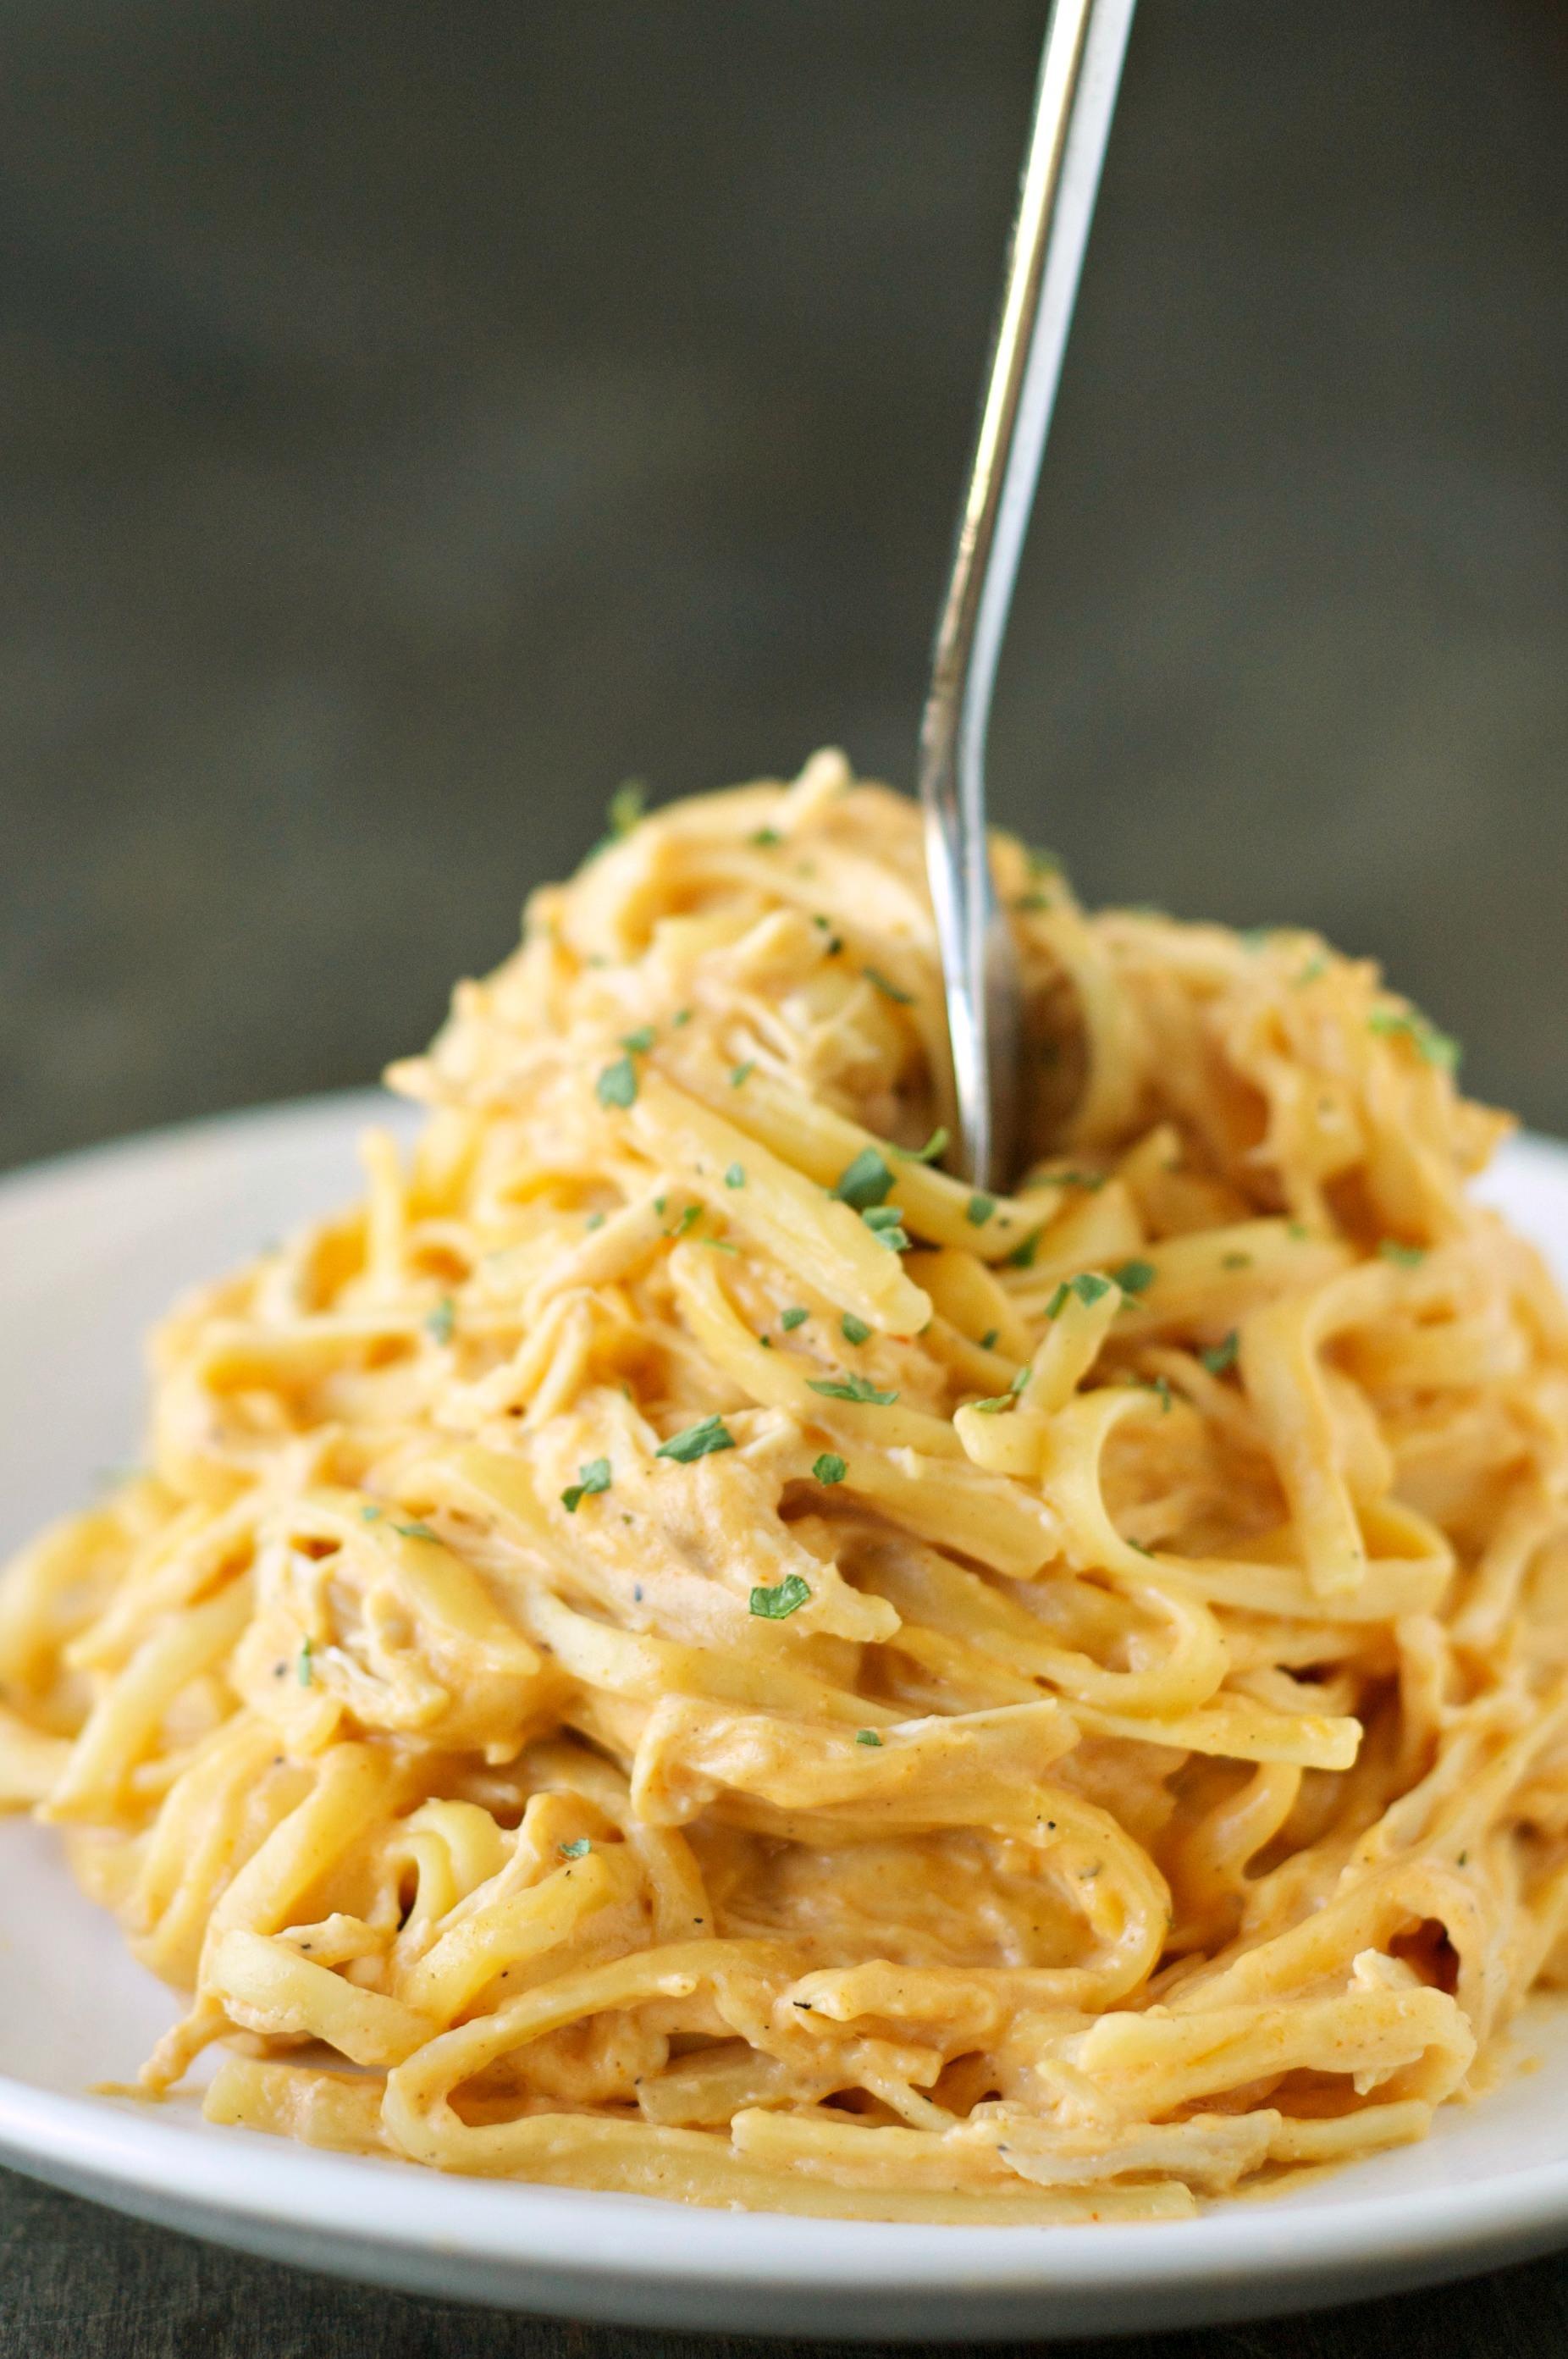 Crockpot Chicken Spaghetti  Slow Cooker Cheesy Buffalo Chicken Pasta Slow Cooker Gourmet